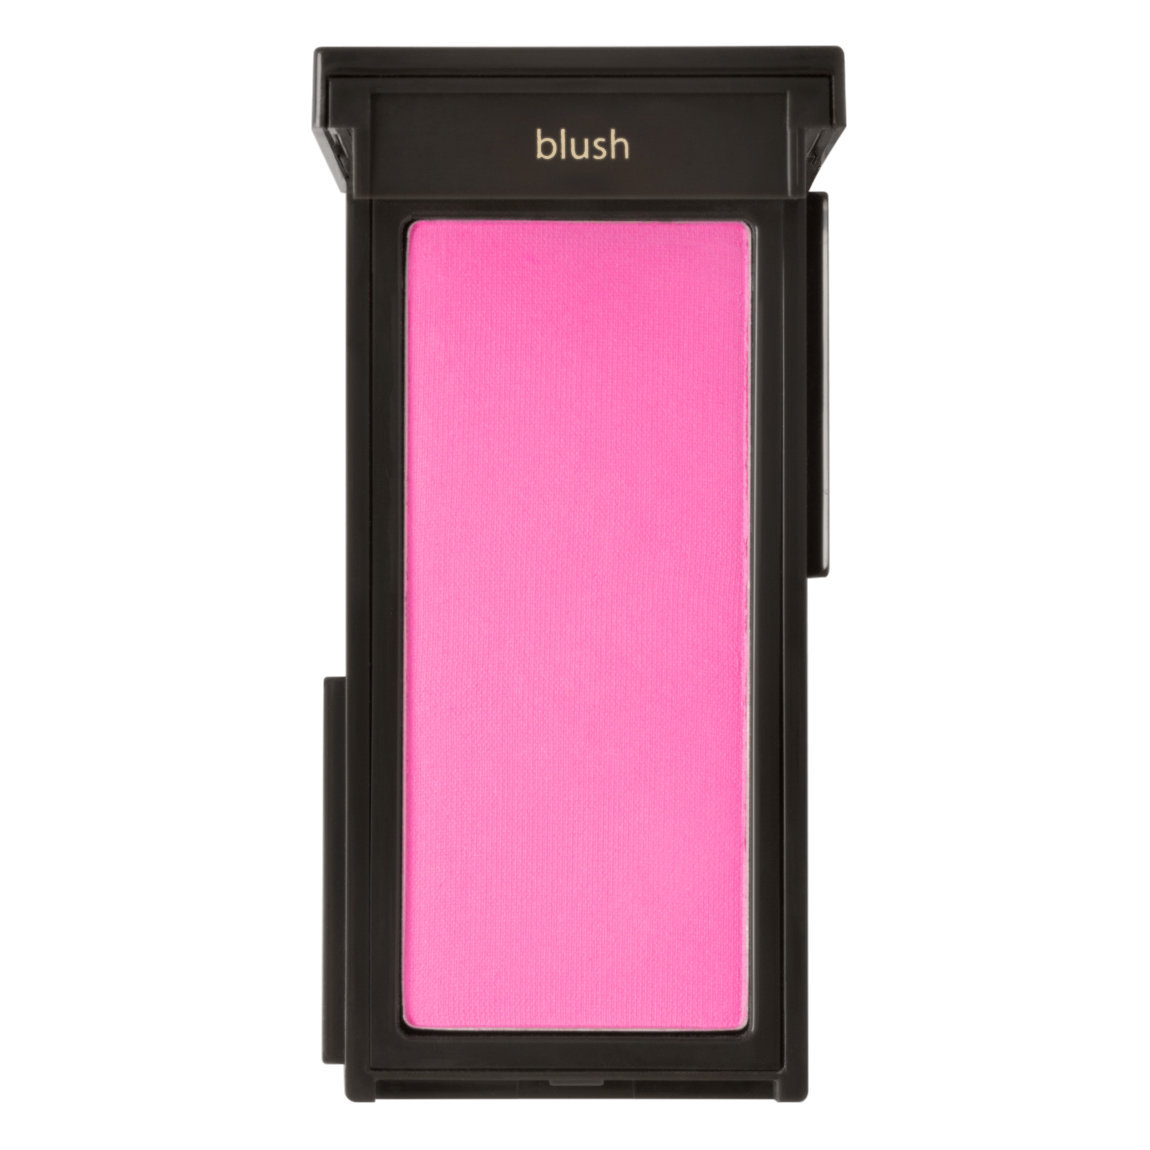 Jouer Cosmetics Mineral Powder Blush Peony alternative view 1.